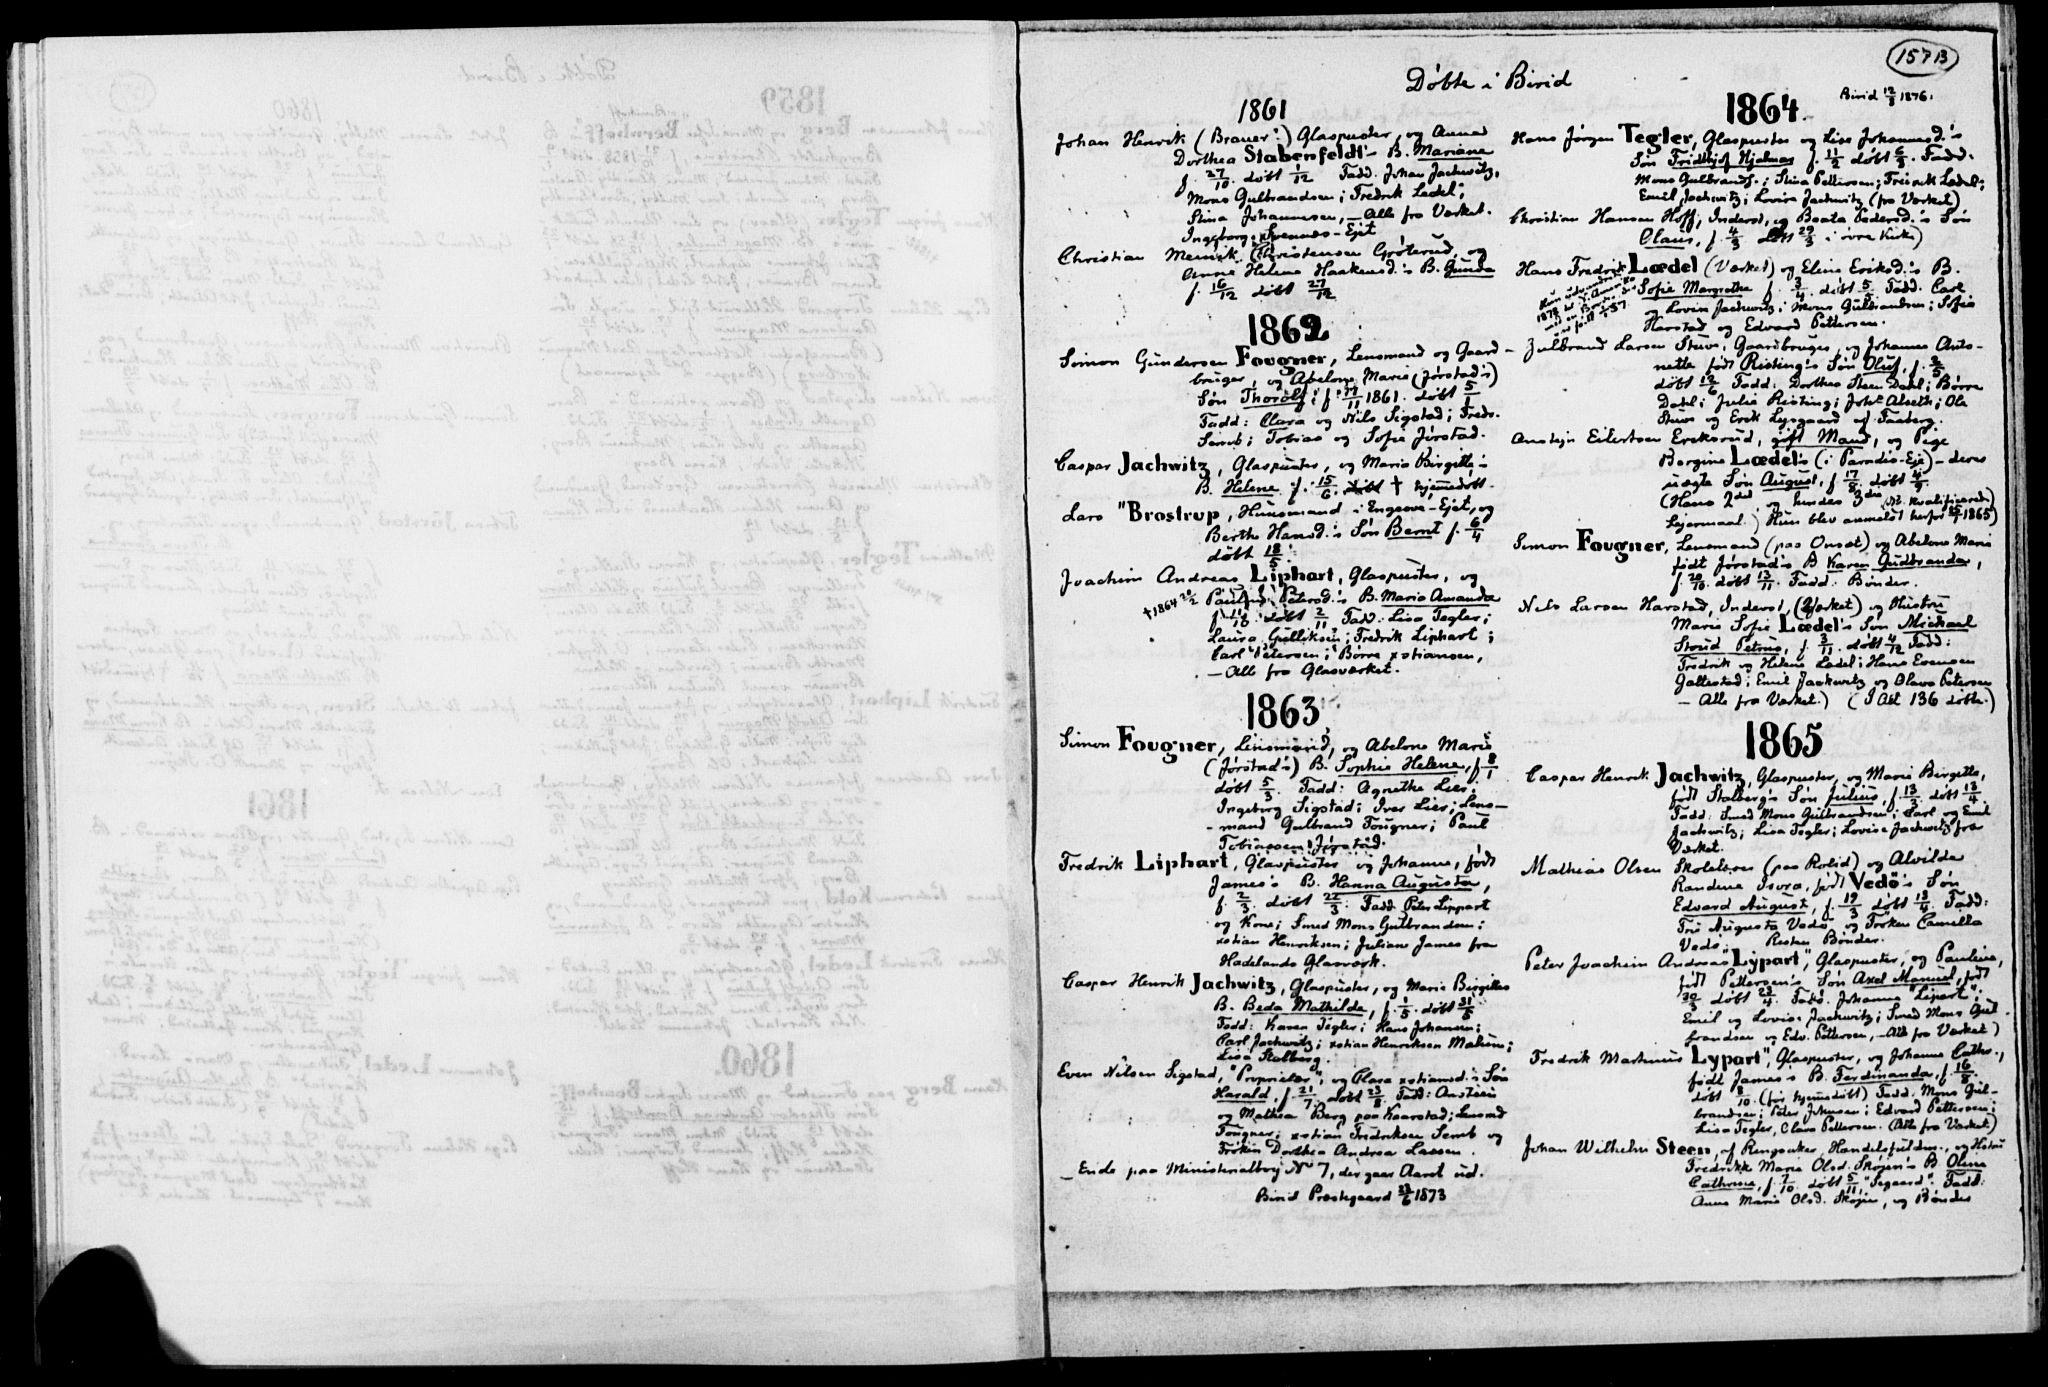 SAH, Biri prestekontor, Ministerialbok, 1730-1879, s. 157b